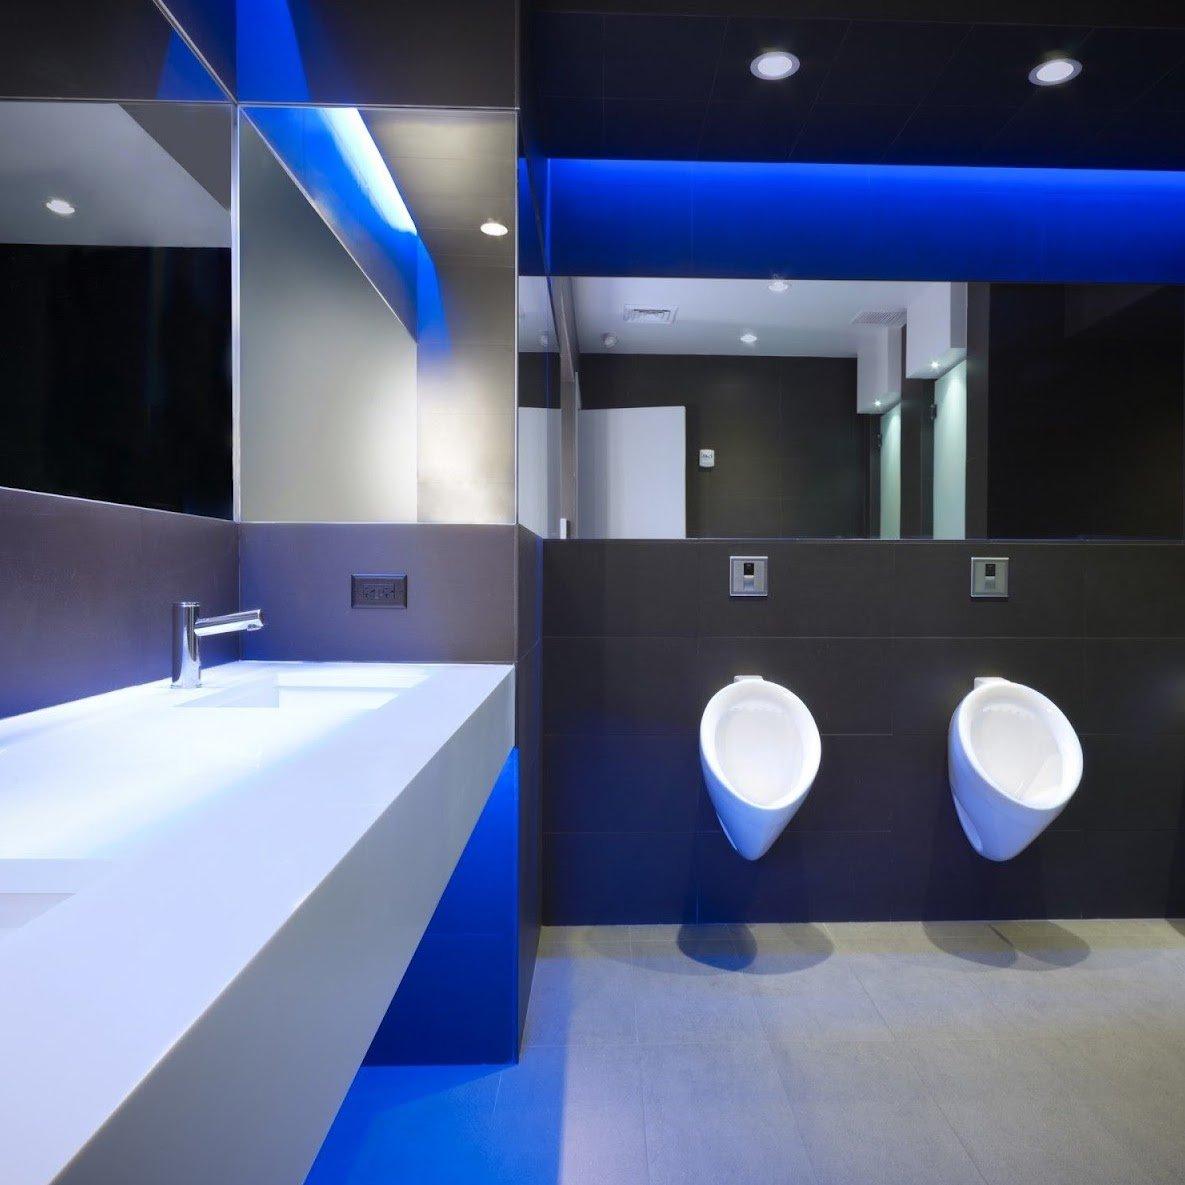 How do you make a corporate washroom inviting?